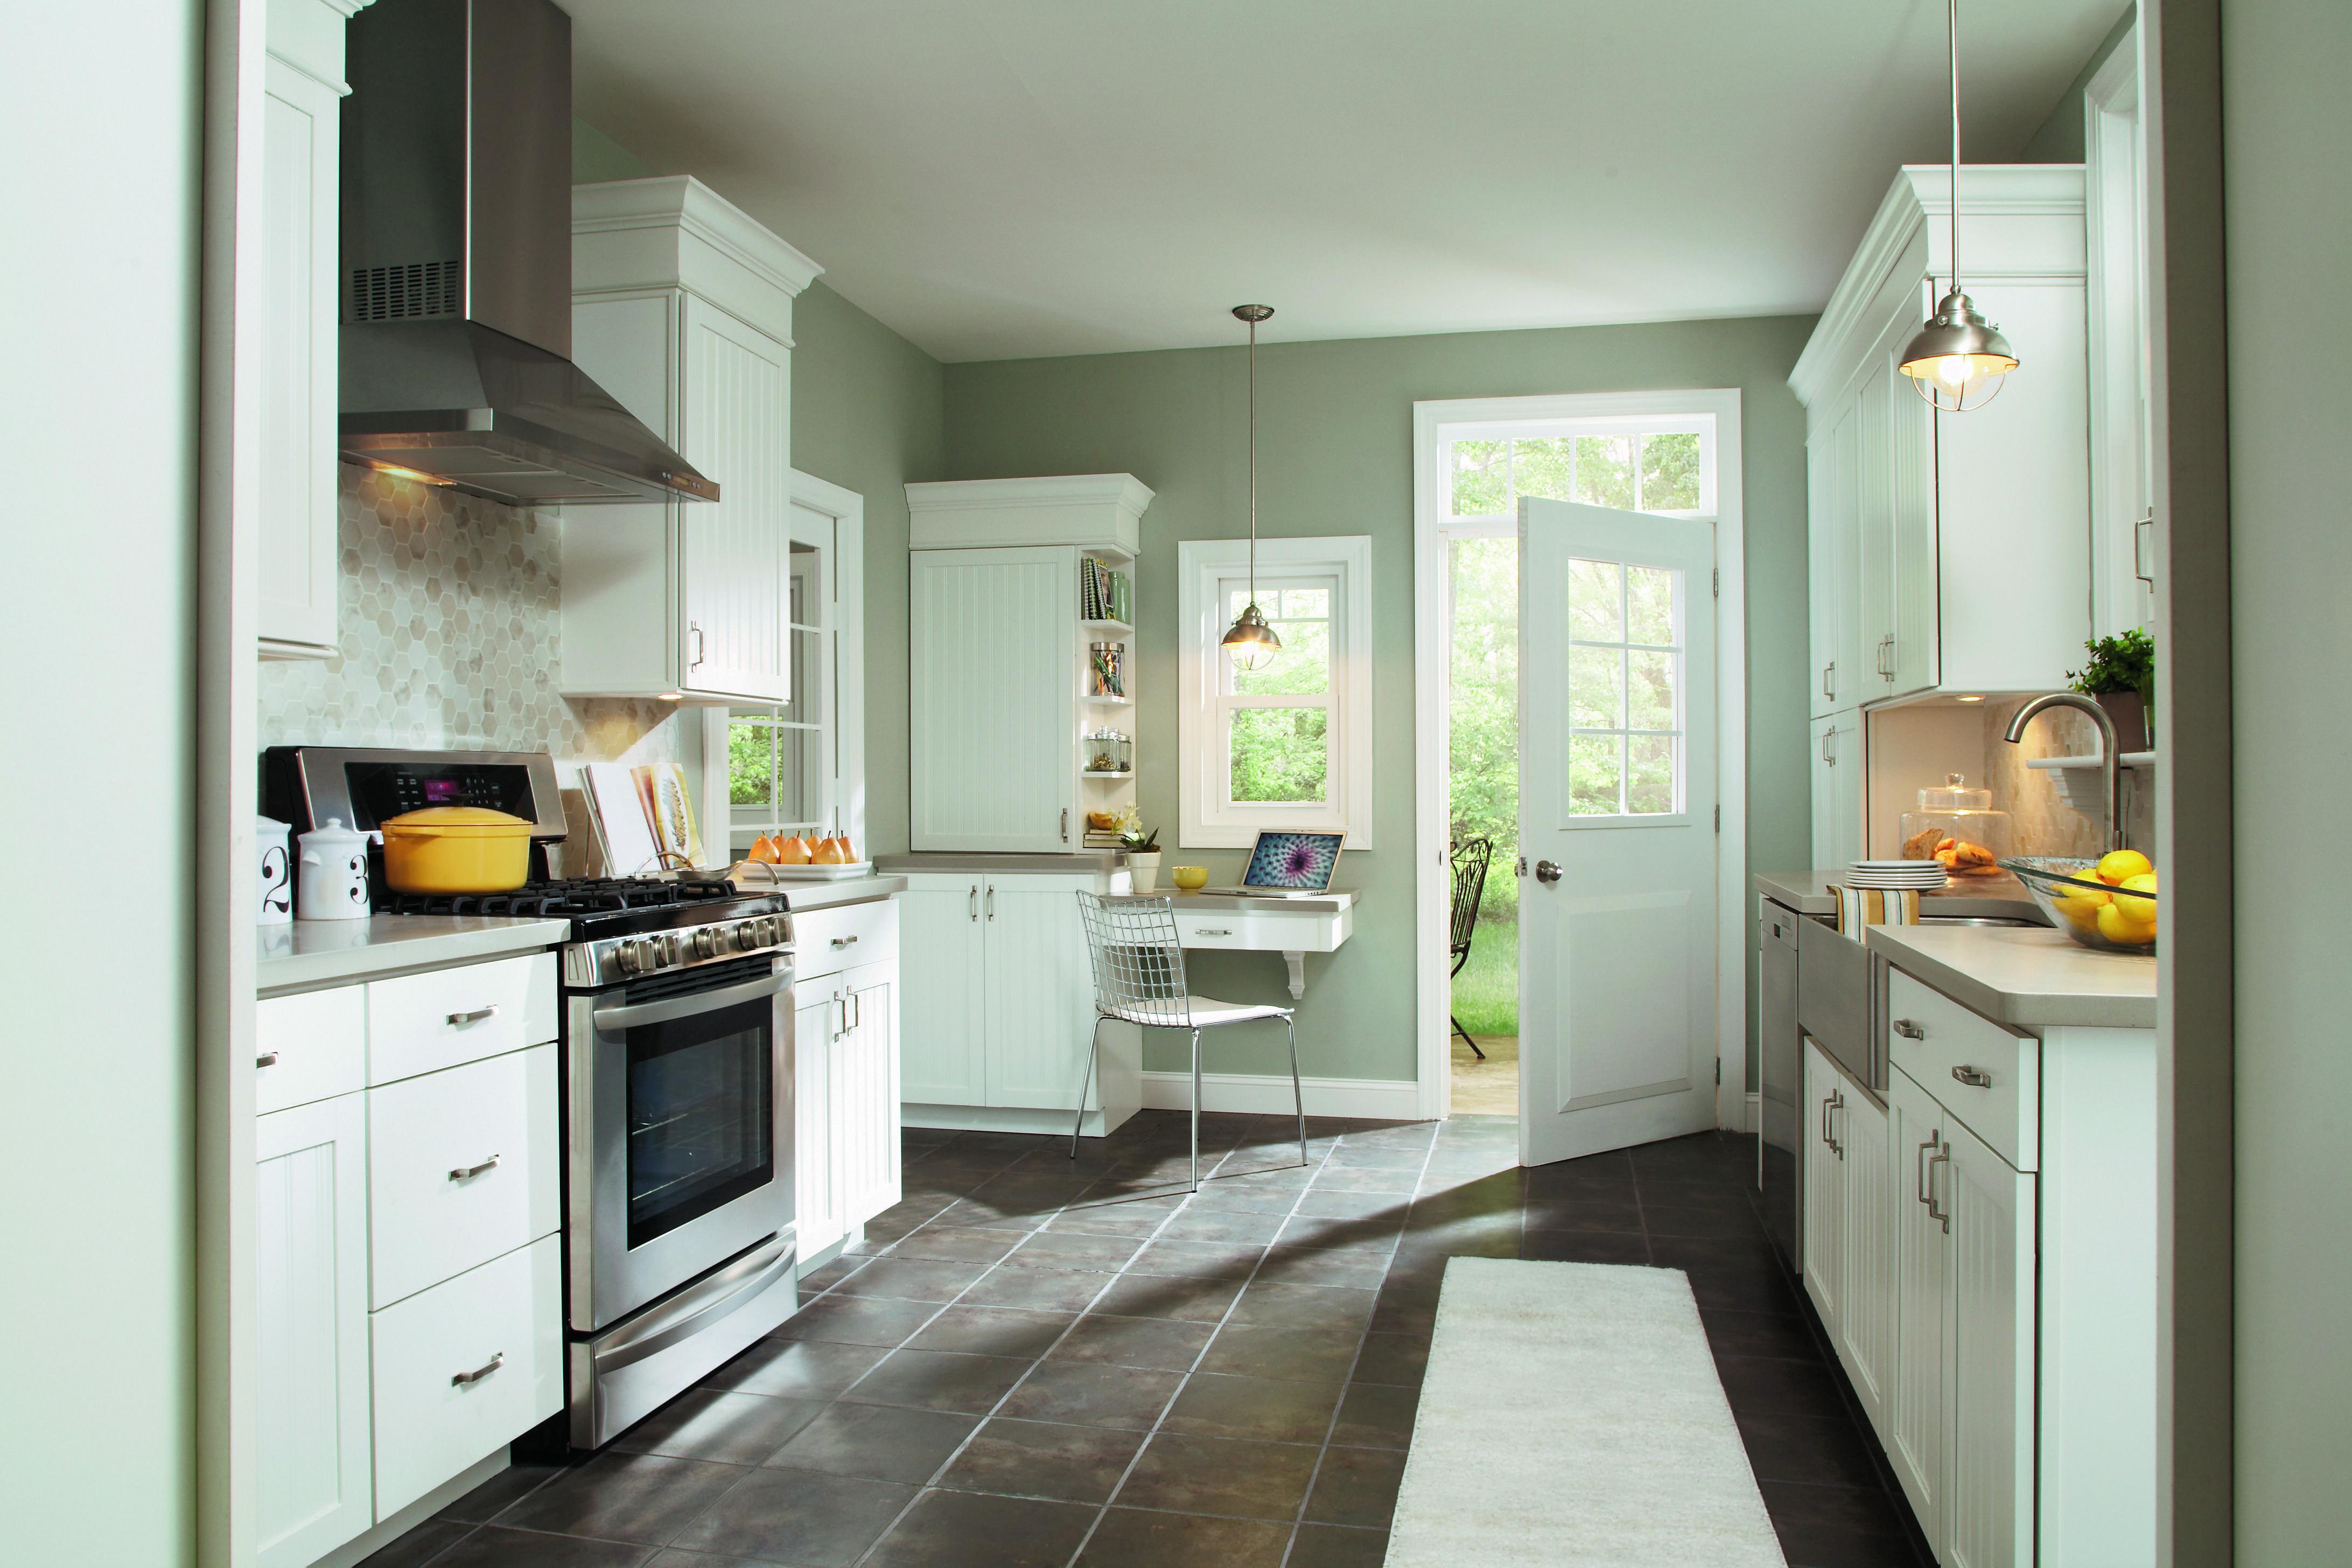 Best Kitchen Gallery: Aristokraft Ellsworth Door Style With Purestyle™ White Finish of Benjamin Moore Sea Haze Kitchen Cabinets on rachelxblog.com